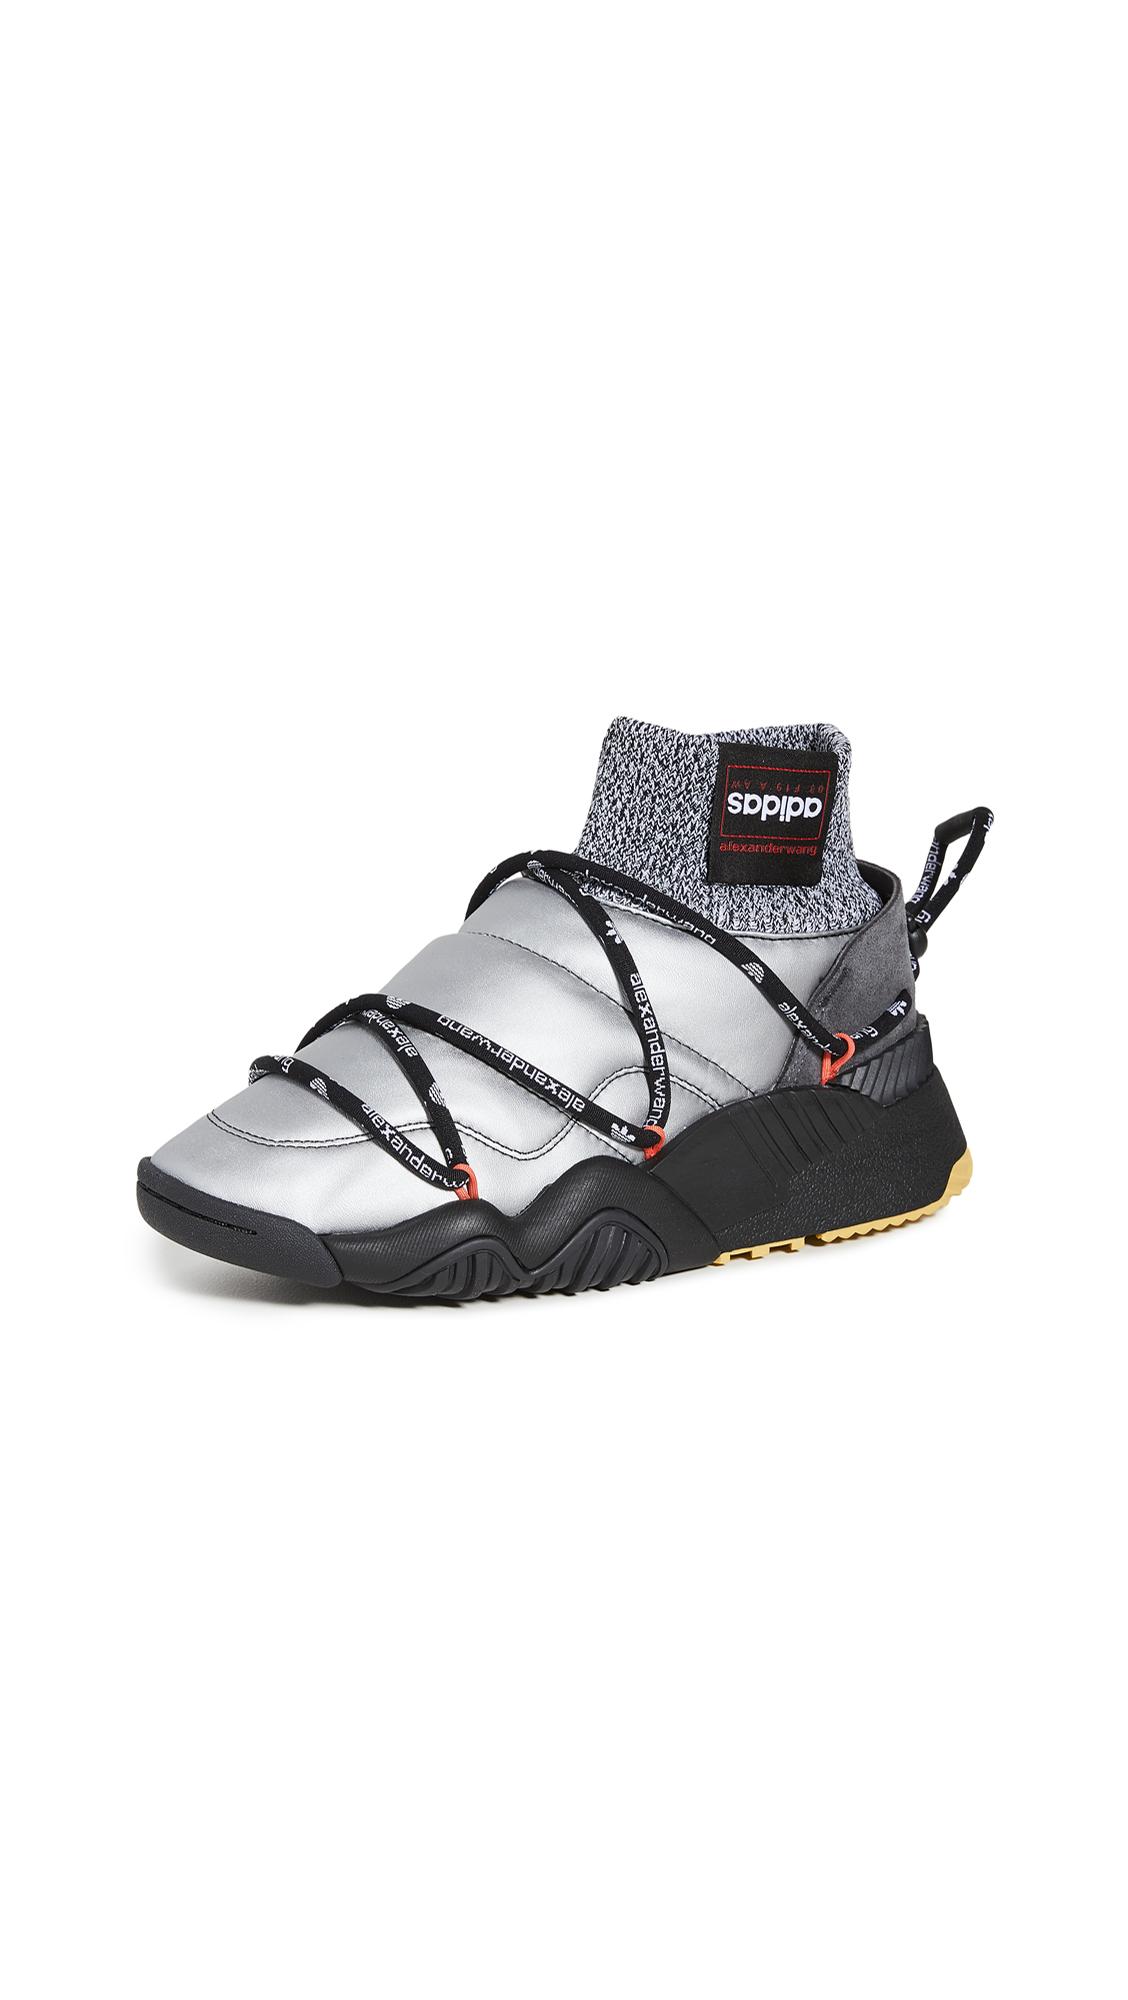 Buy adidas Originals by Alexander Wang online - photo of adidas Originals by Alexander Wang Aw Puff Trainers